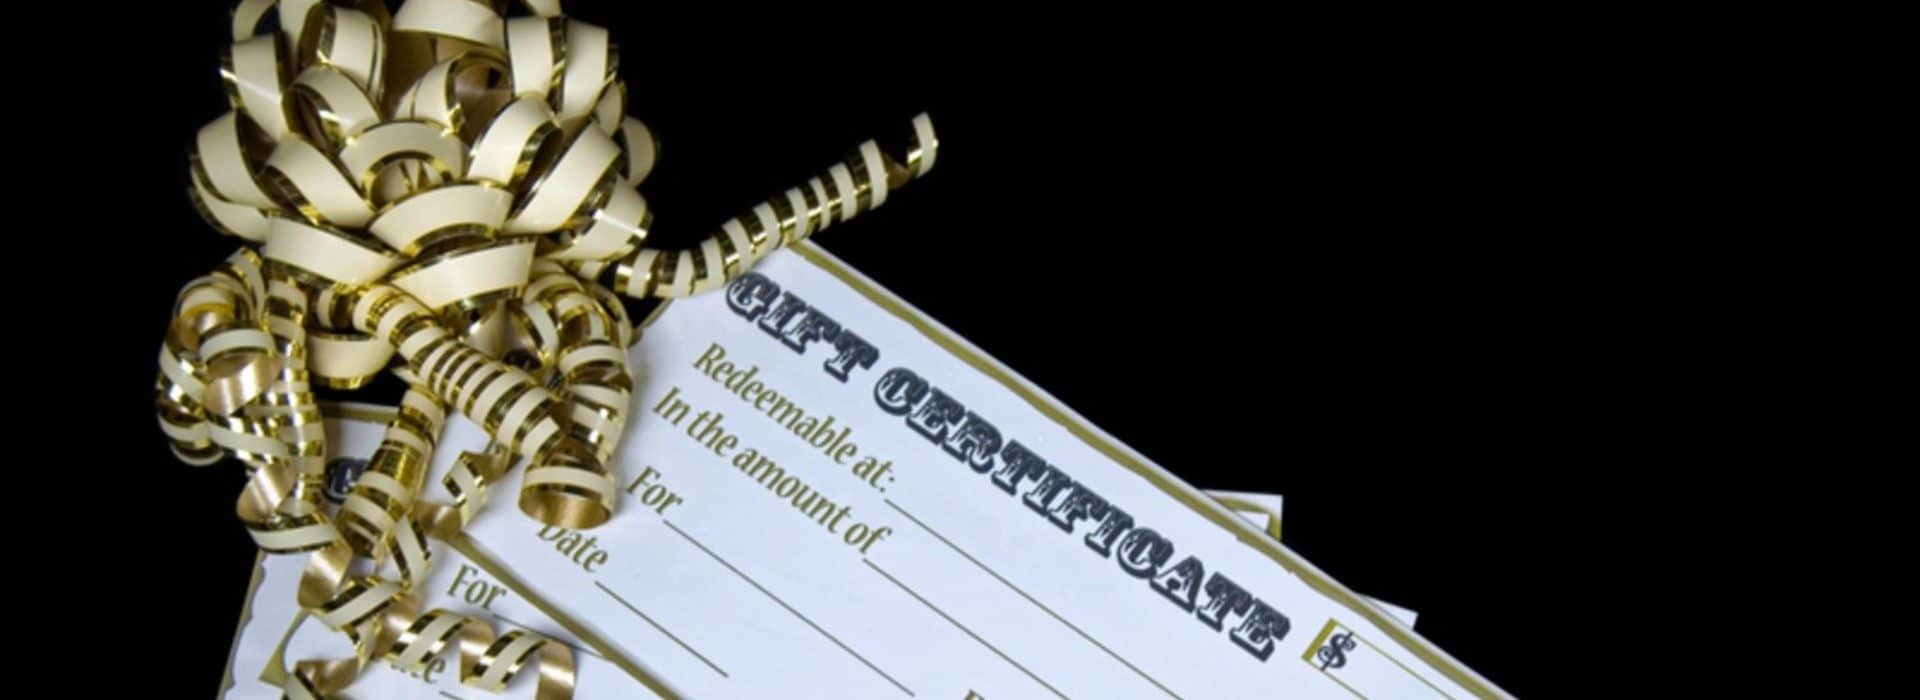 Gift Certificate, black background gold ribbon